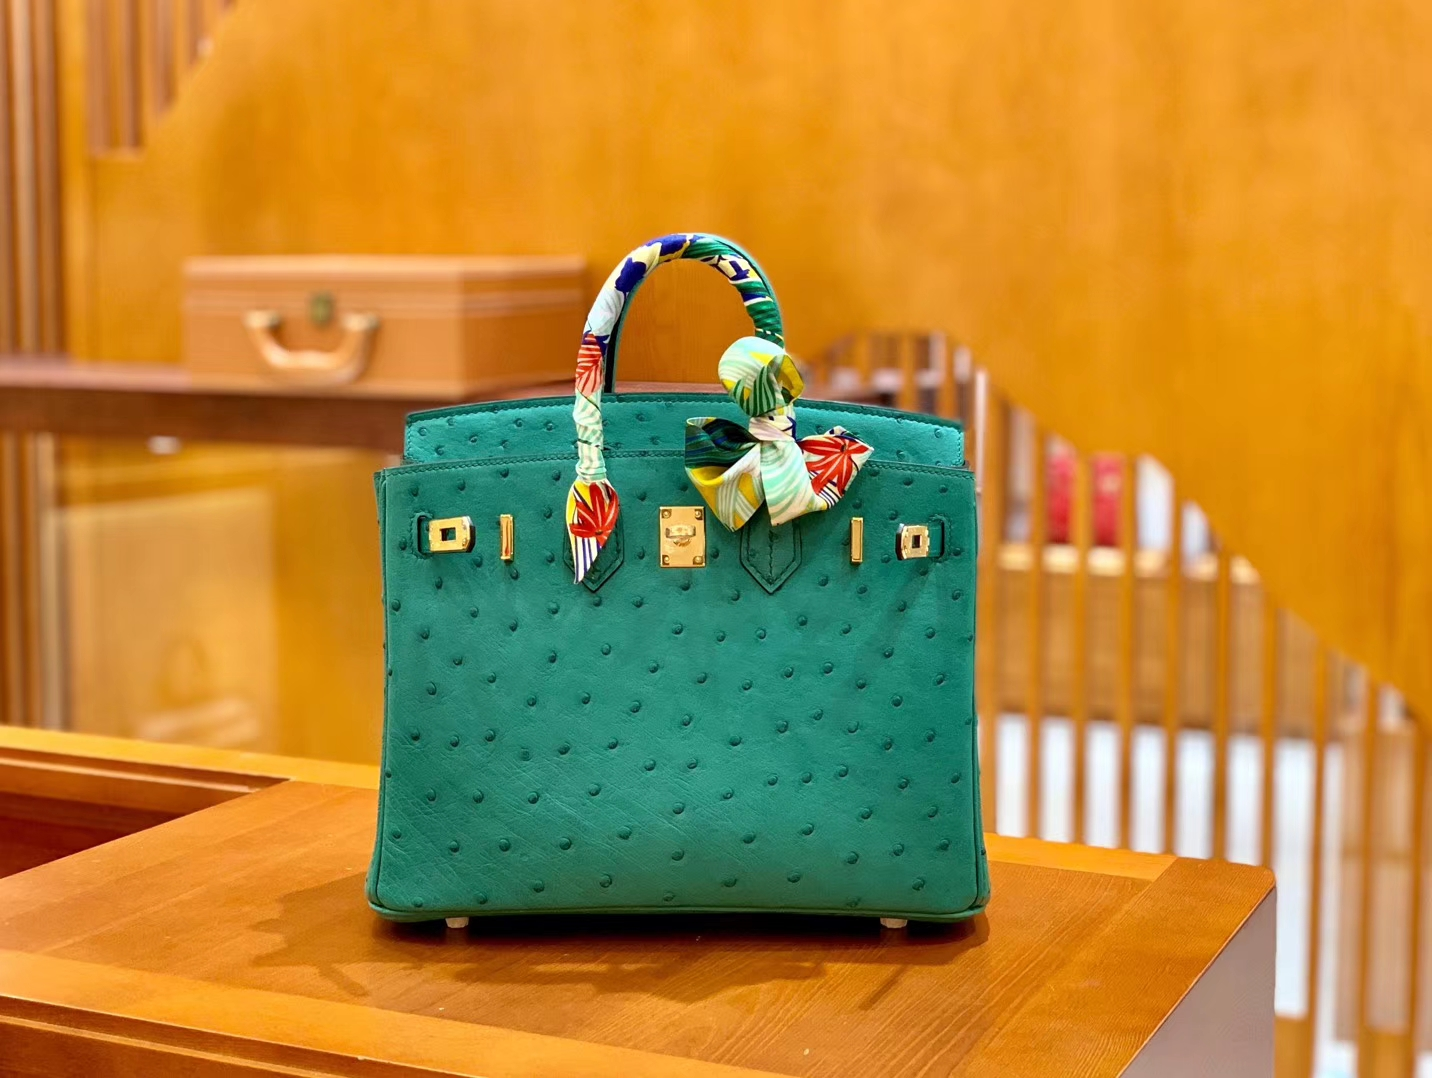 Hermès(爱马仕)Birkin 25cm 湖水绿 金扣 南非KK鸵鸟皮 全手工缝制